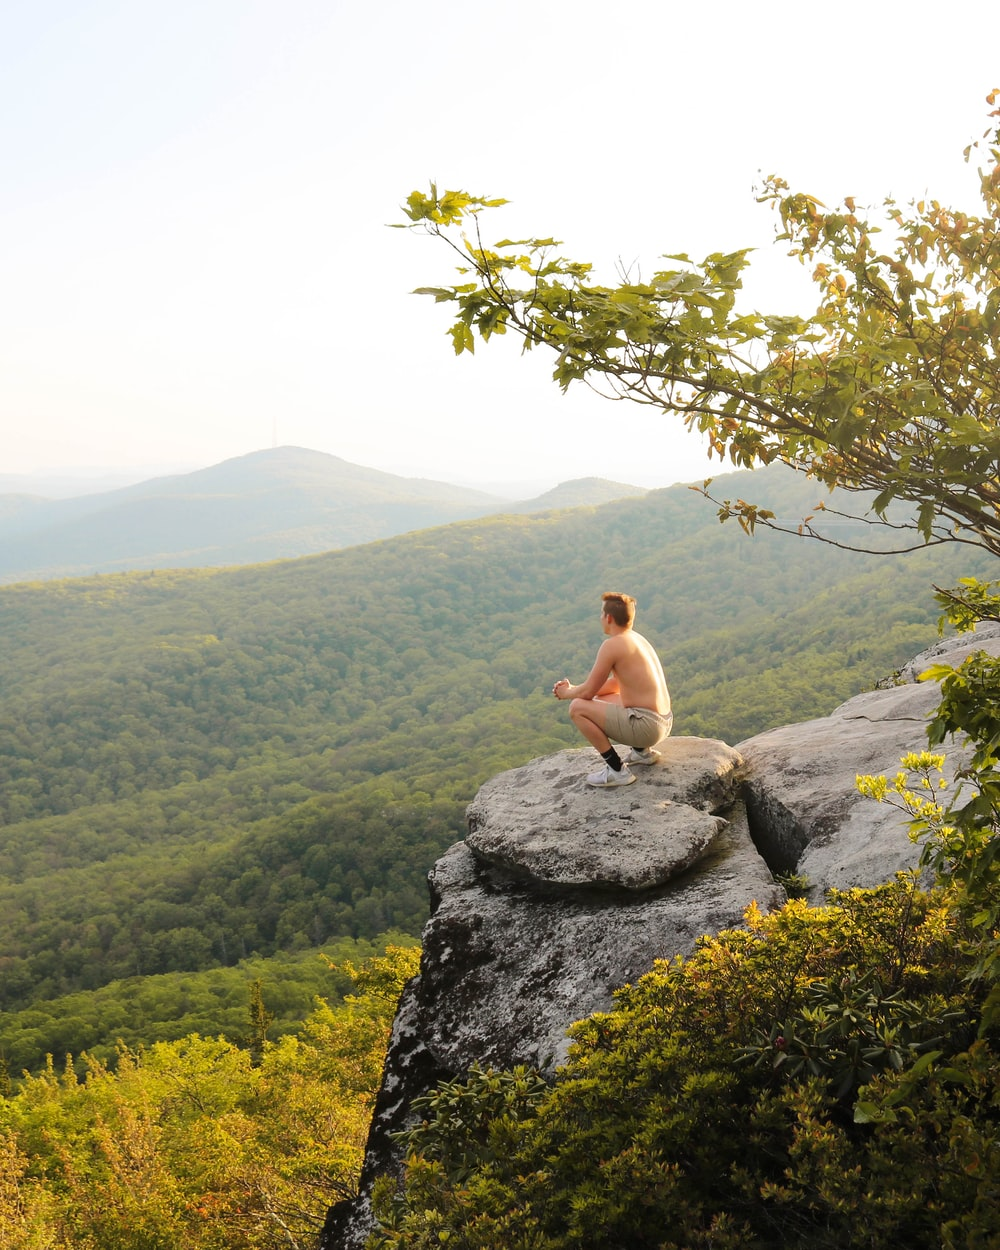 man sitting on rock boulder